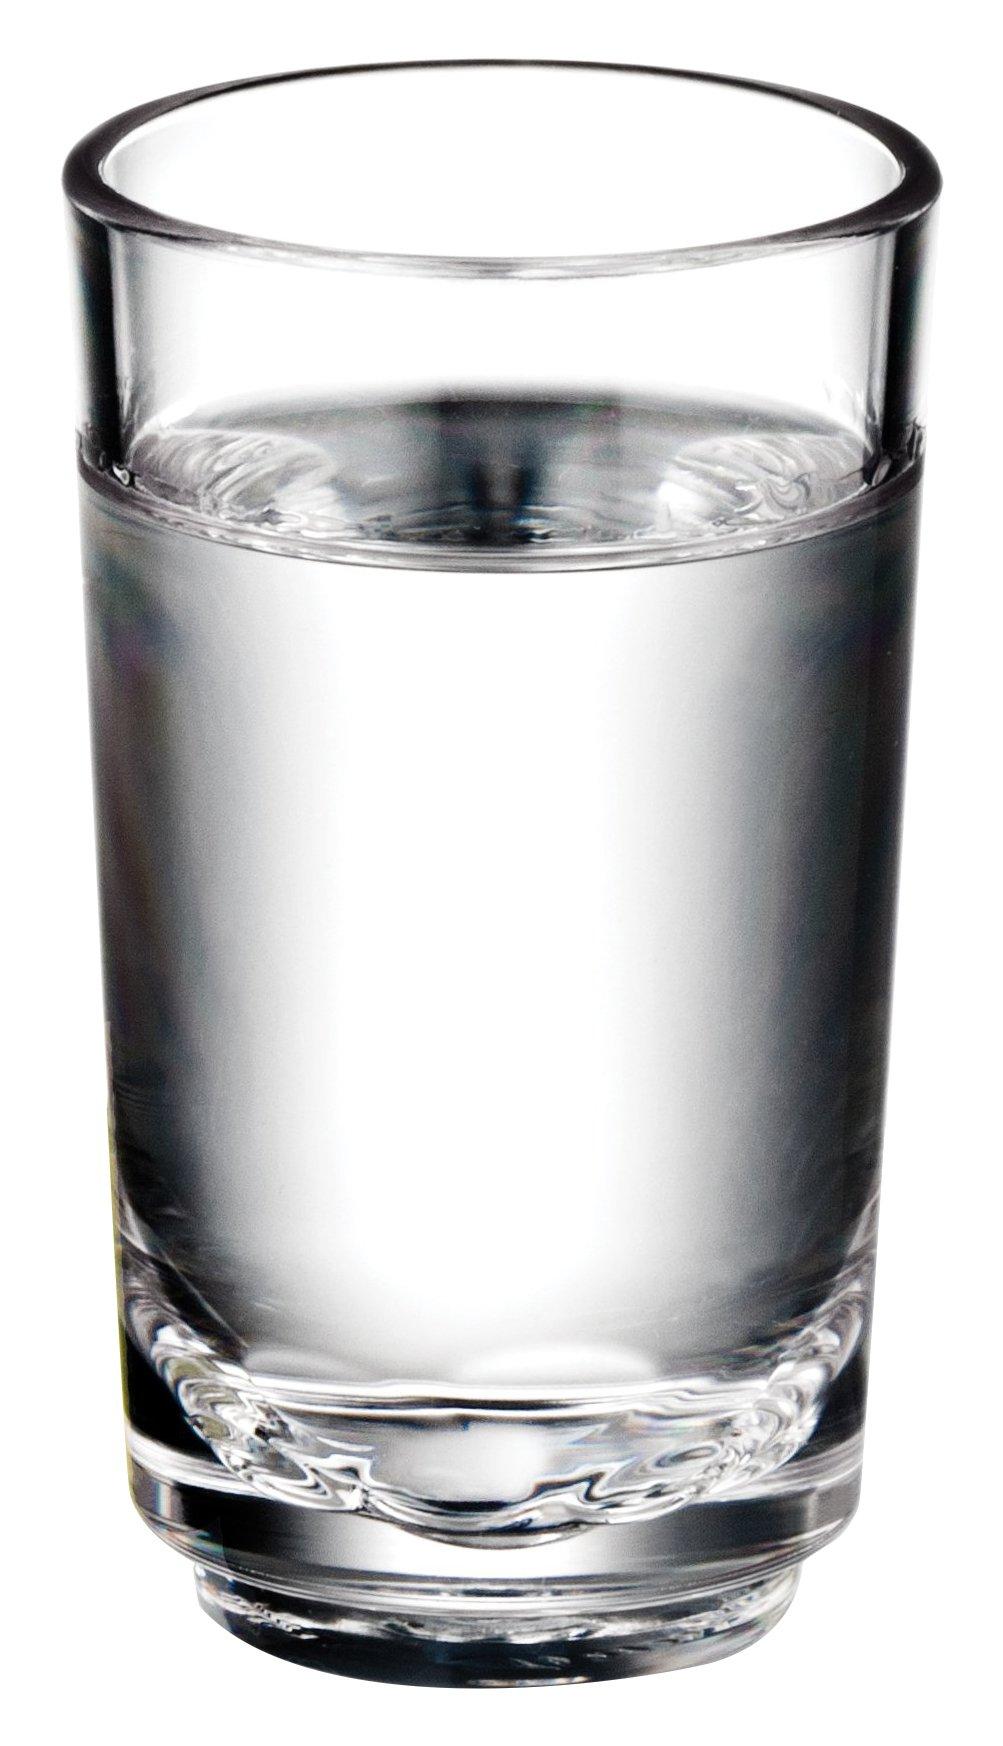 Drinique Elite Shot Glass Unbreakable BPA-free Tritan, Premium Plastic Drinkware, 2 oz., Clear, Case of 42